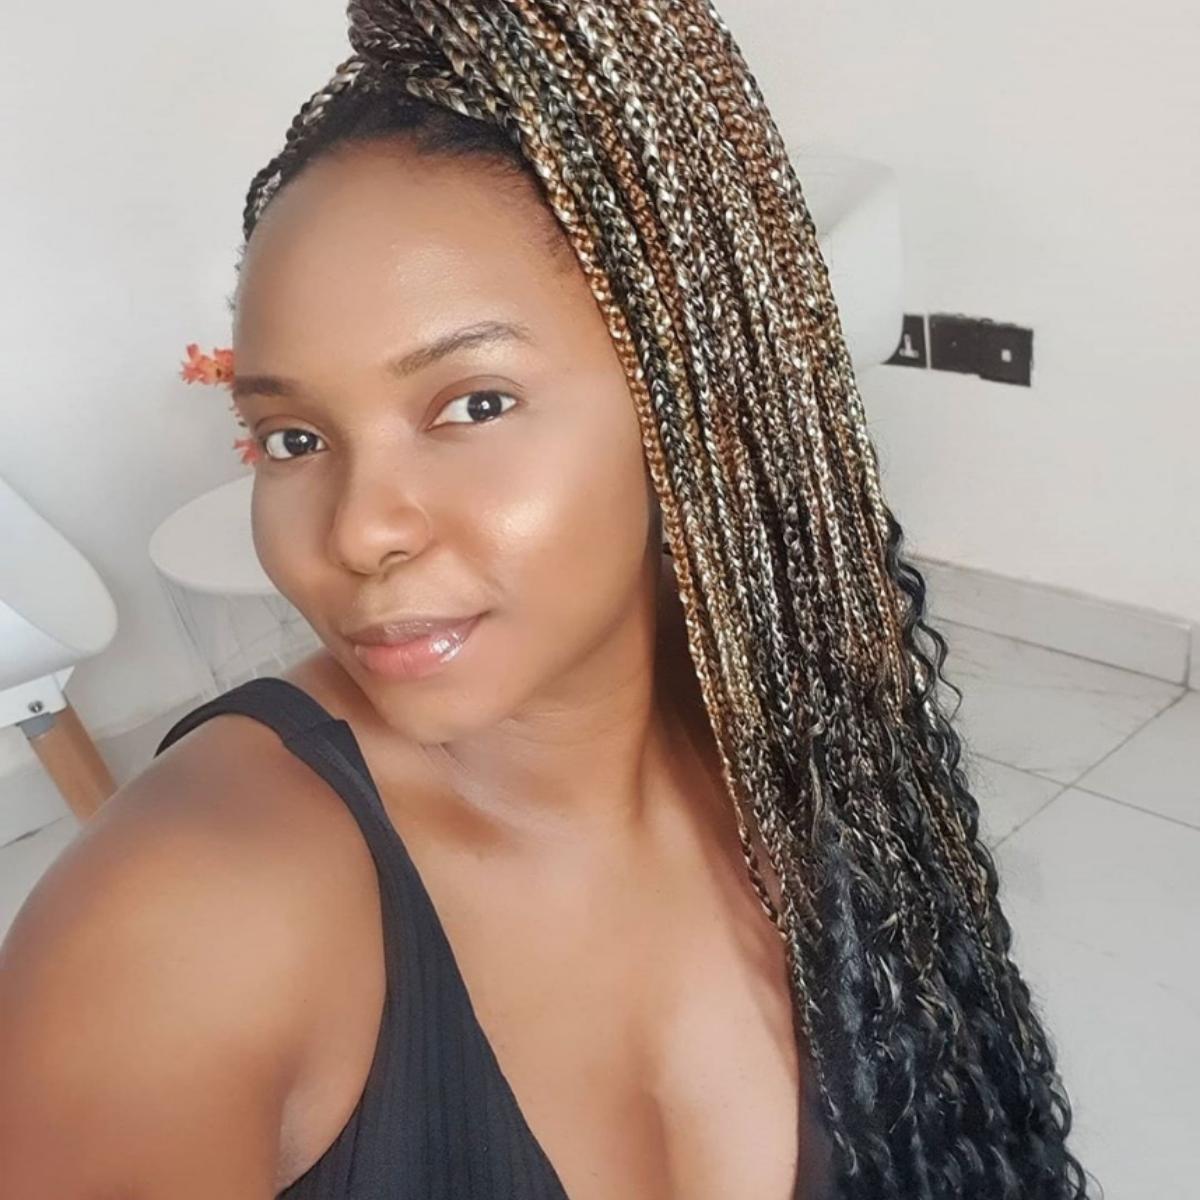 Yemi Alade Mocks Nigeria Over Coronavirus Lockdown